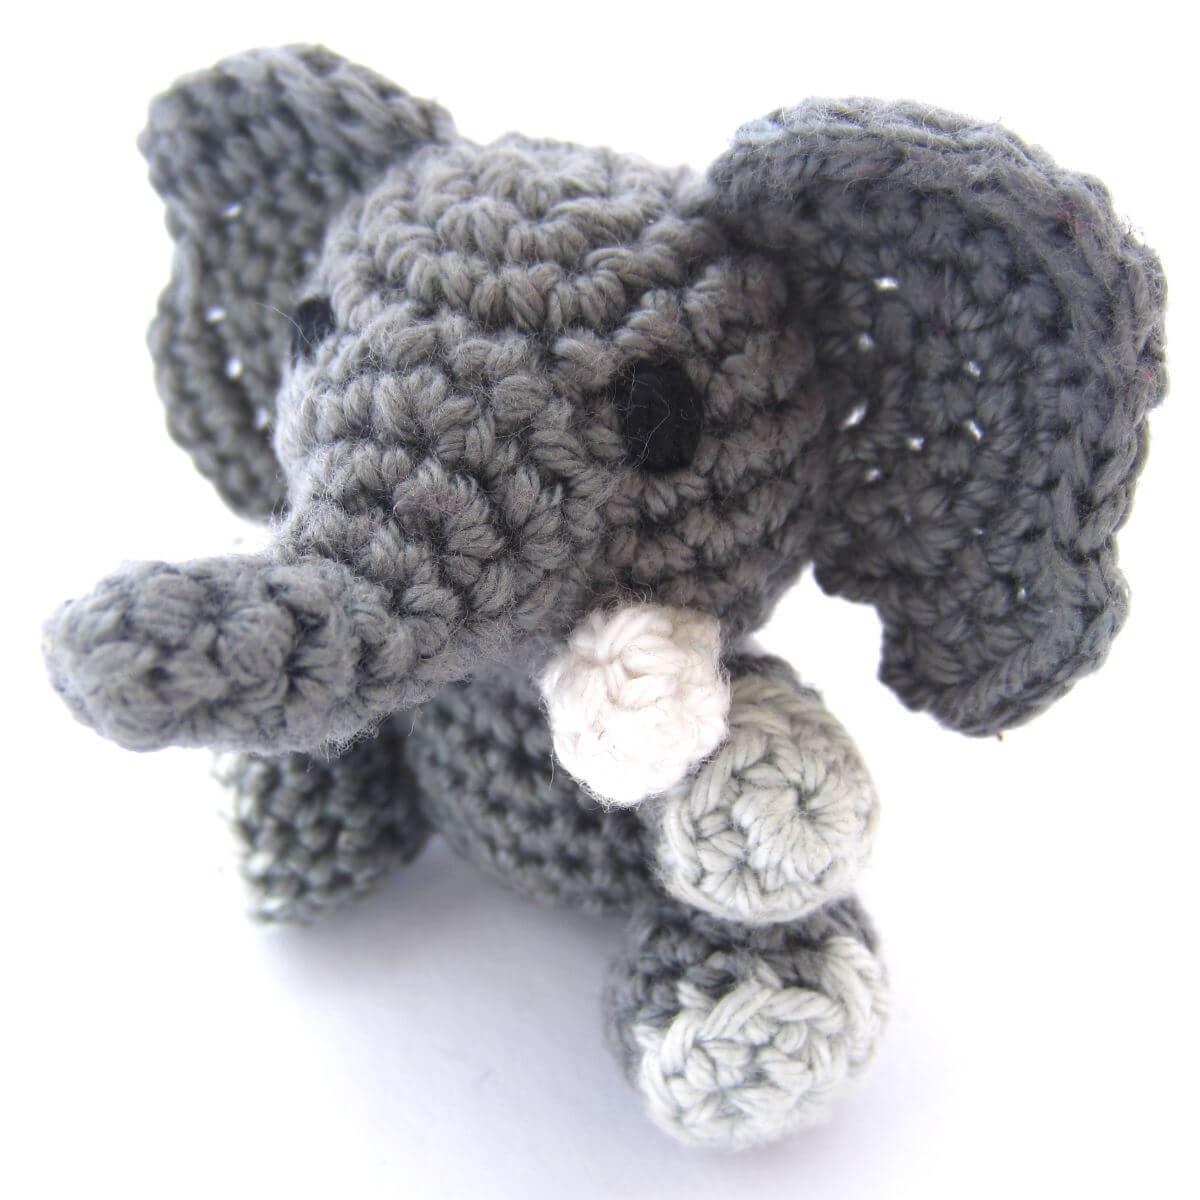 amigurumi crochet elephant pattern supergurumi. Black Bedroom Furniture Sets. Home Design Ideas